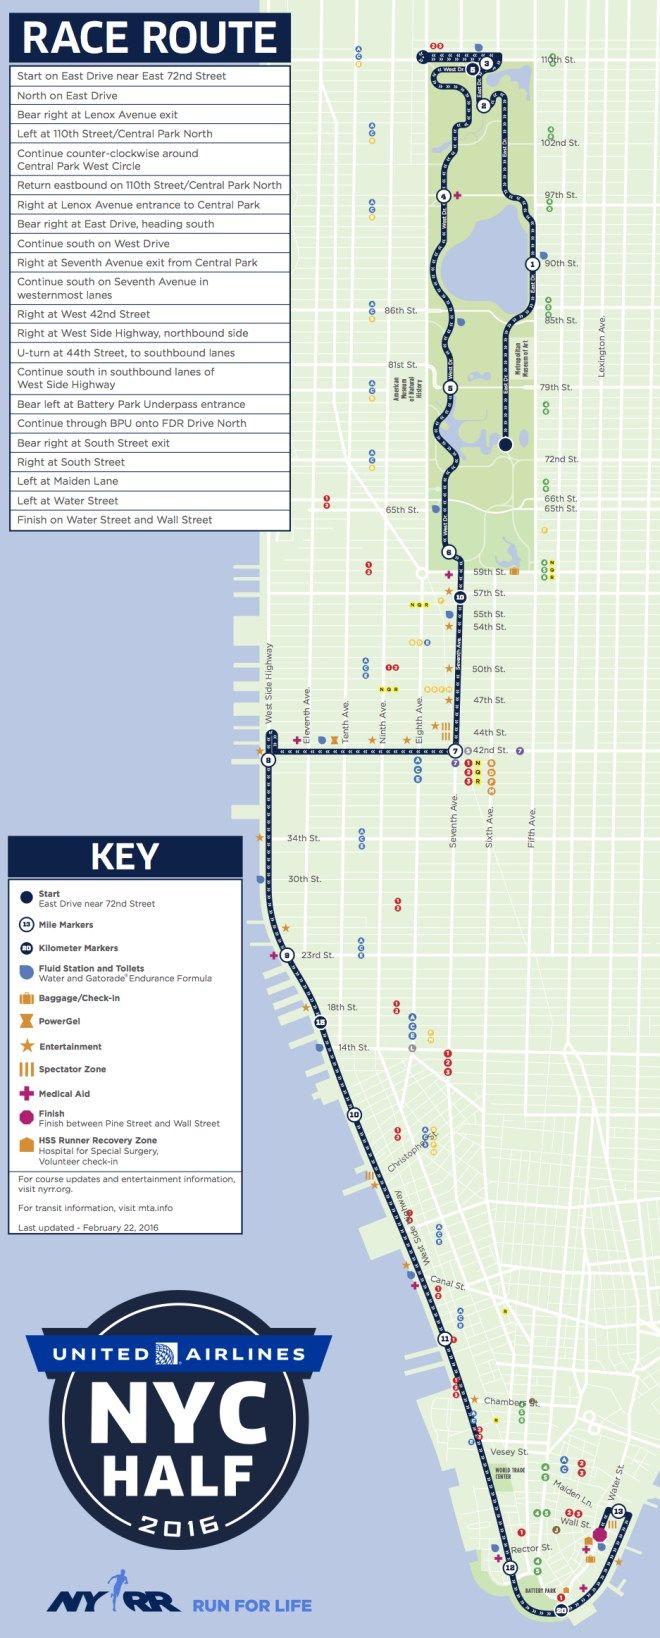 Nyc Half Marathon Route Street Closures New Yorker Tips Nova York Corridas De Rua Nova